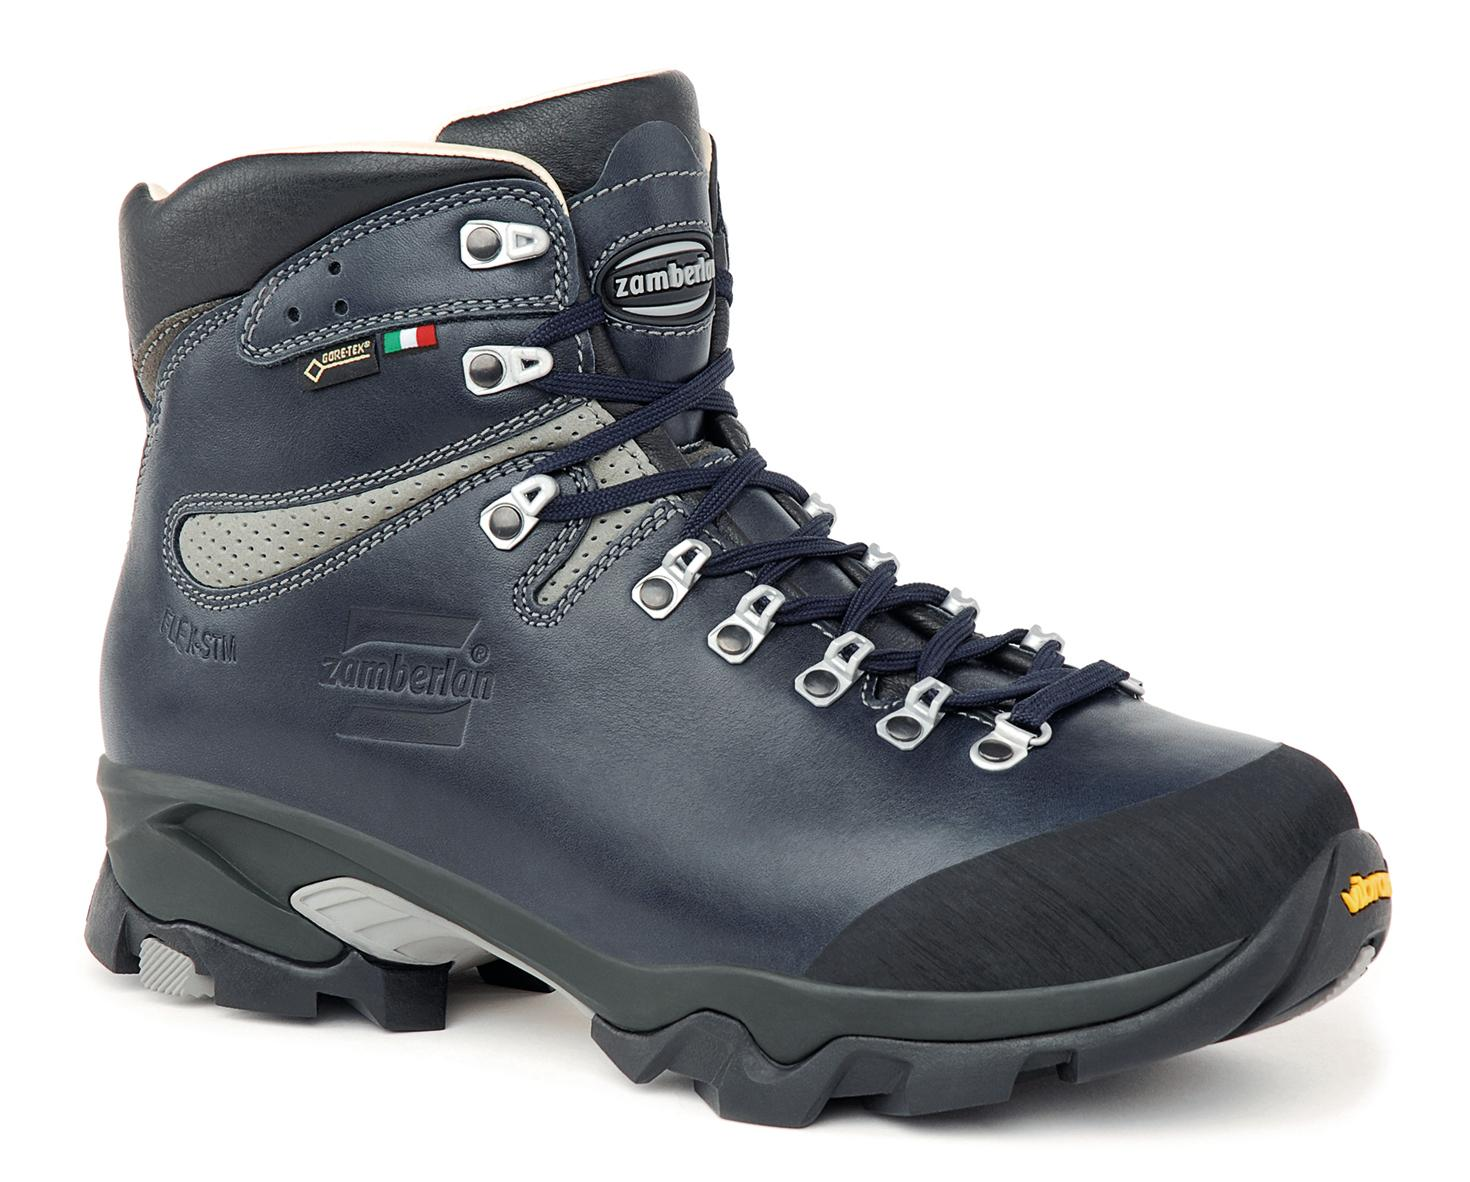 1996 VIOZ LUX GTX® RR   -   Trekking  Boots   -   Waxed Blue